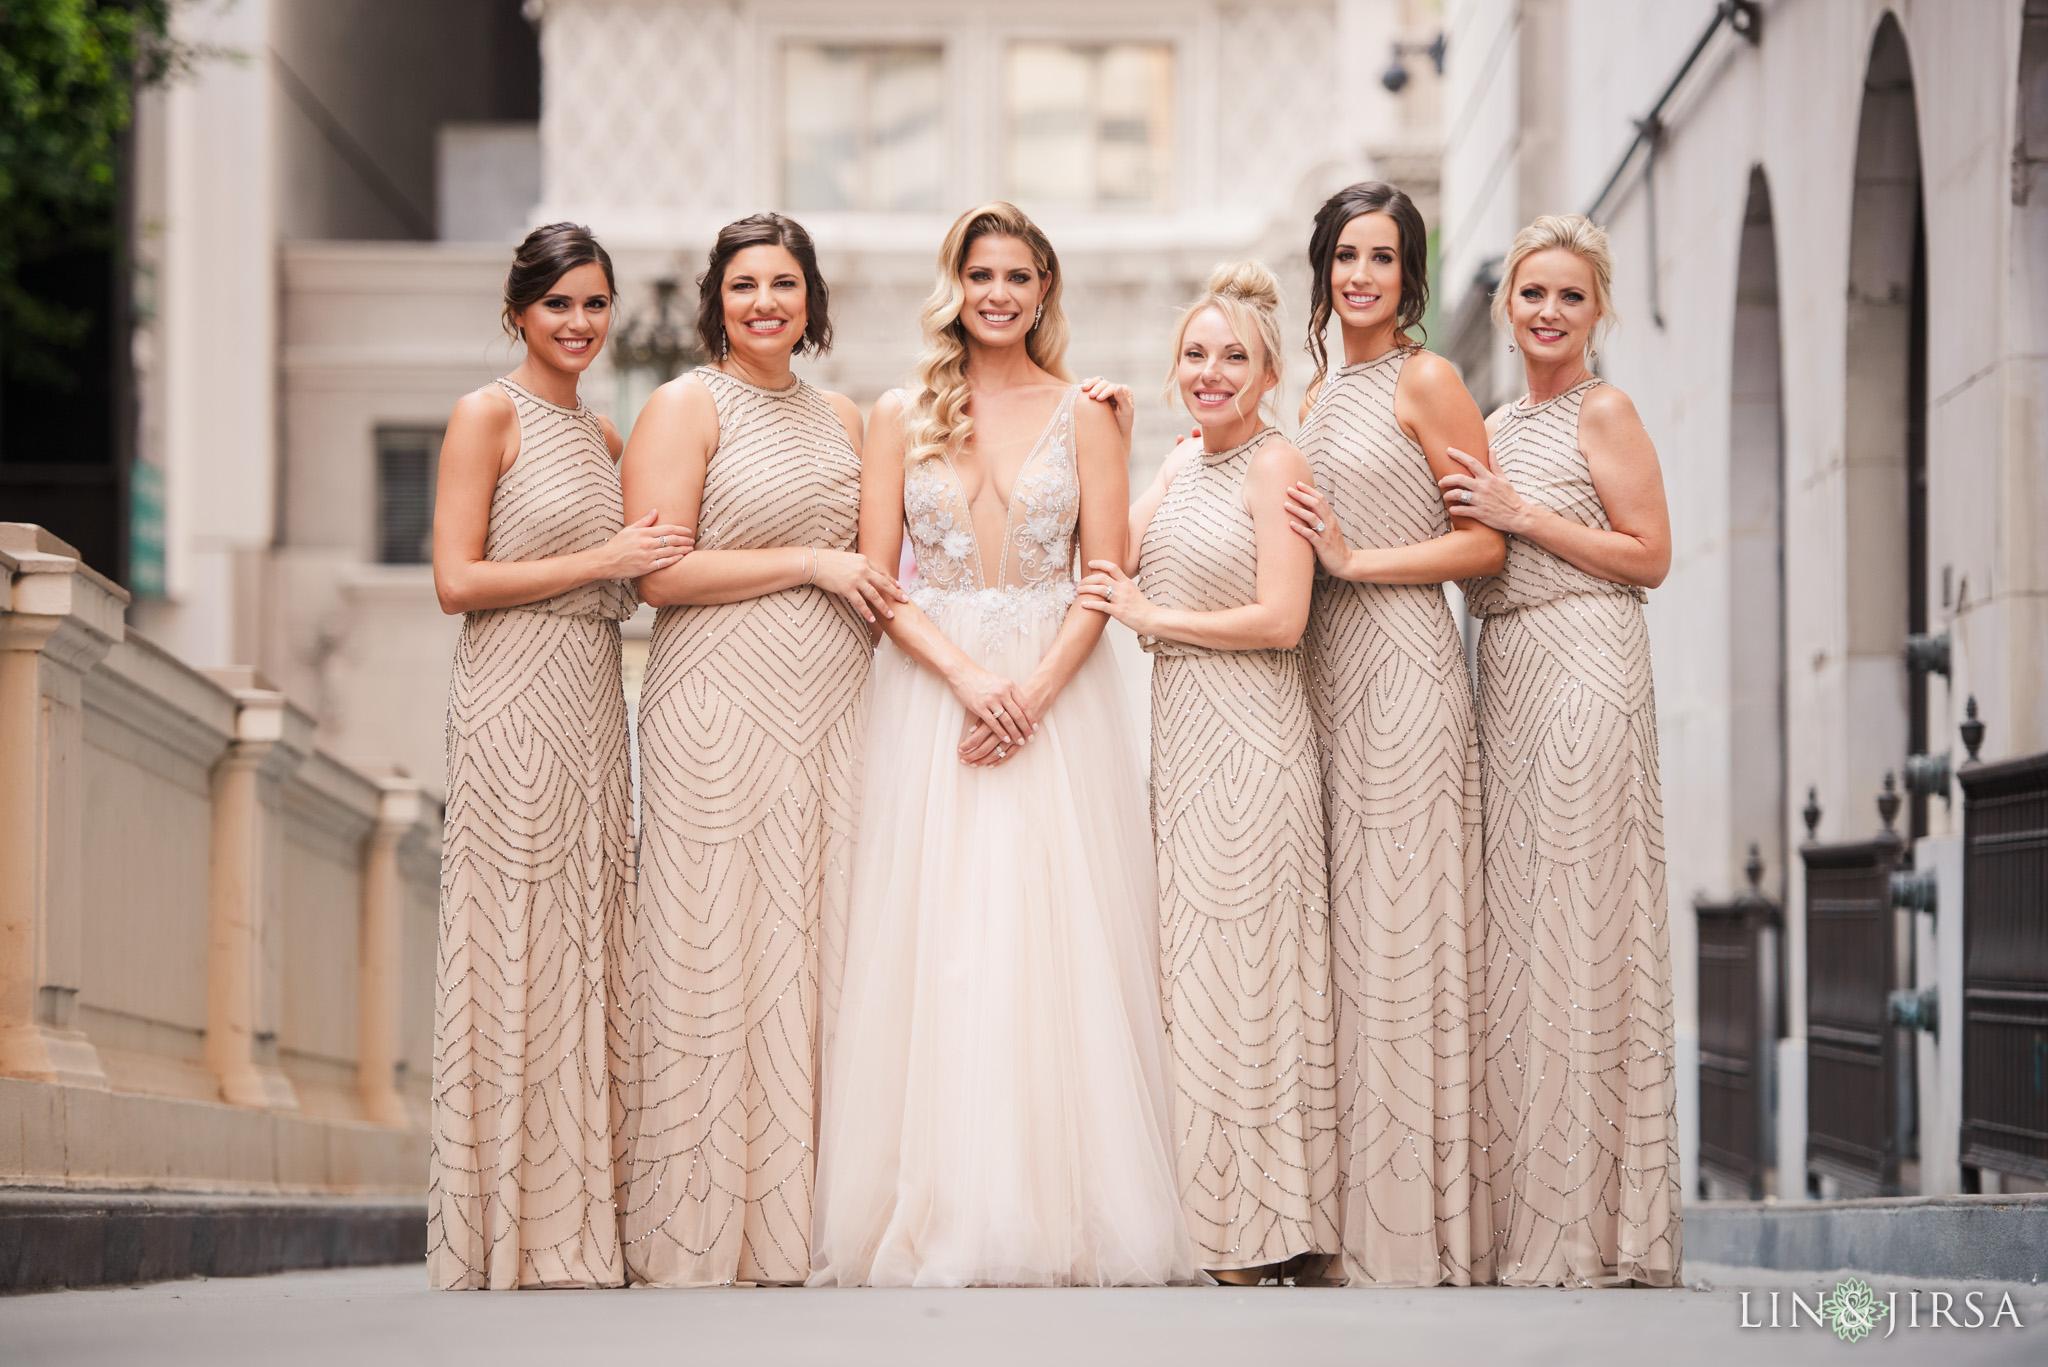 006 millennium biltmore hotel los angeles wedding photography